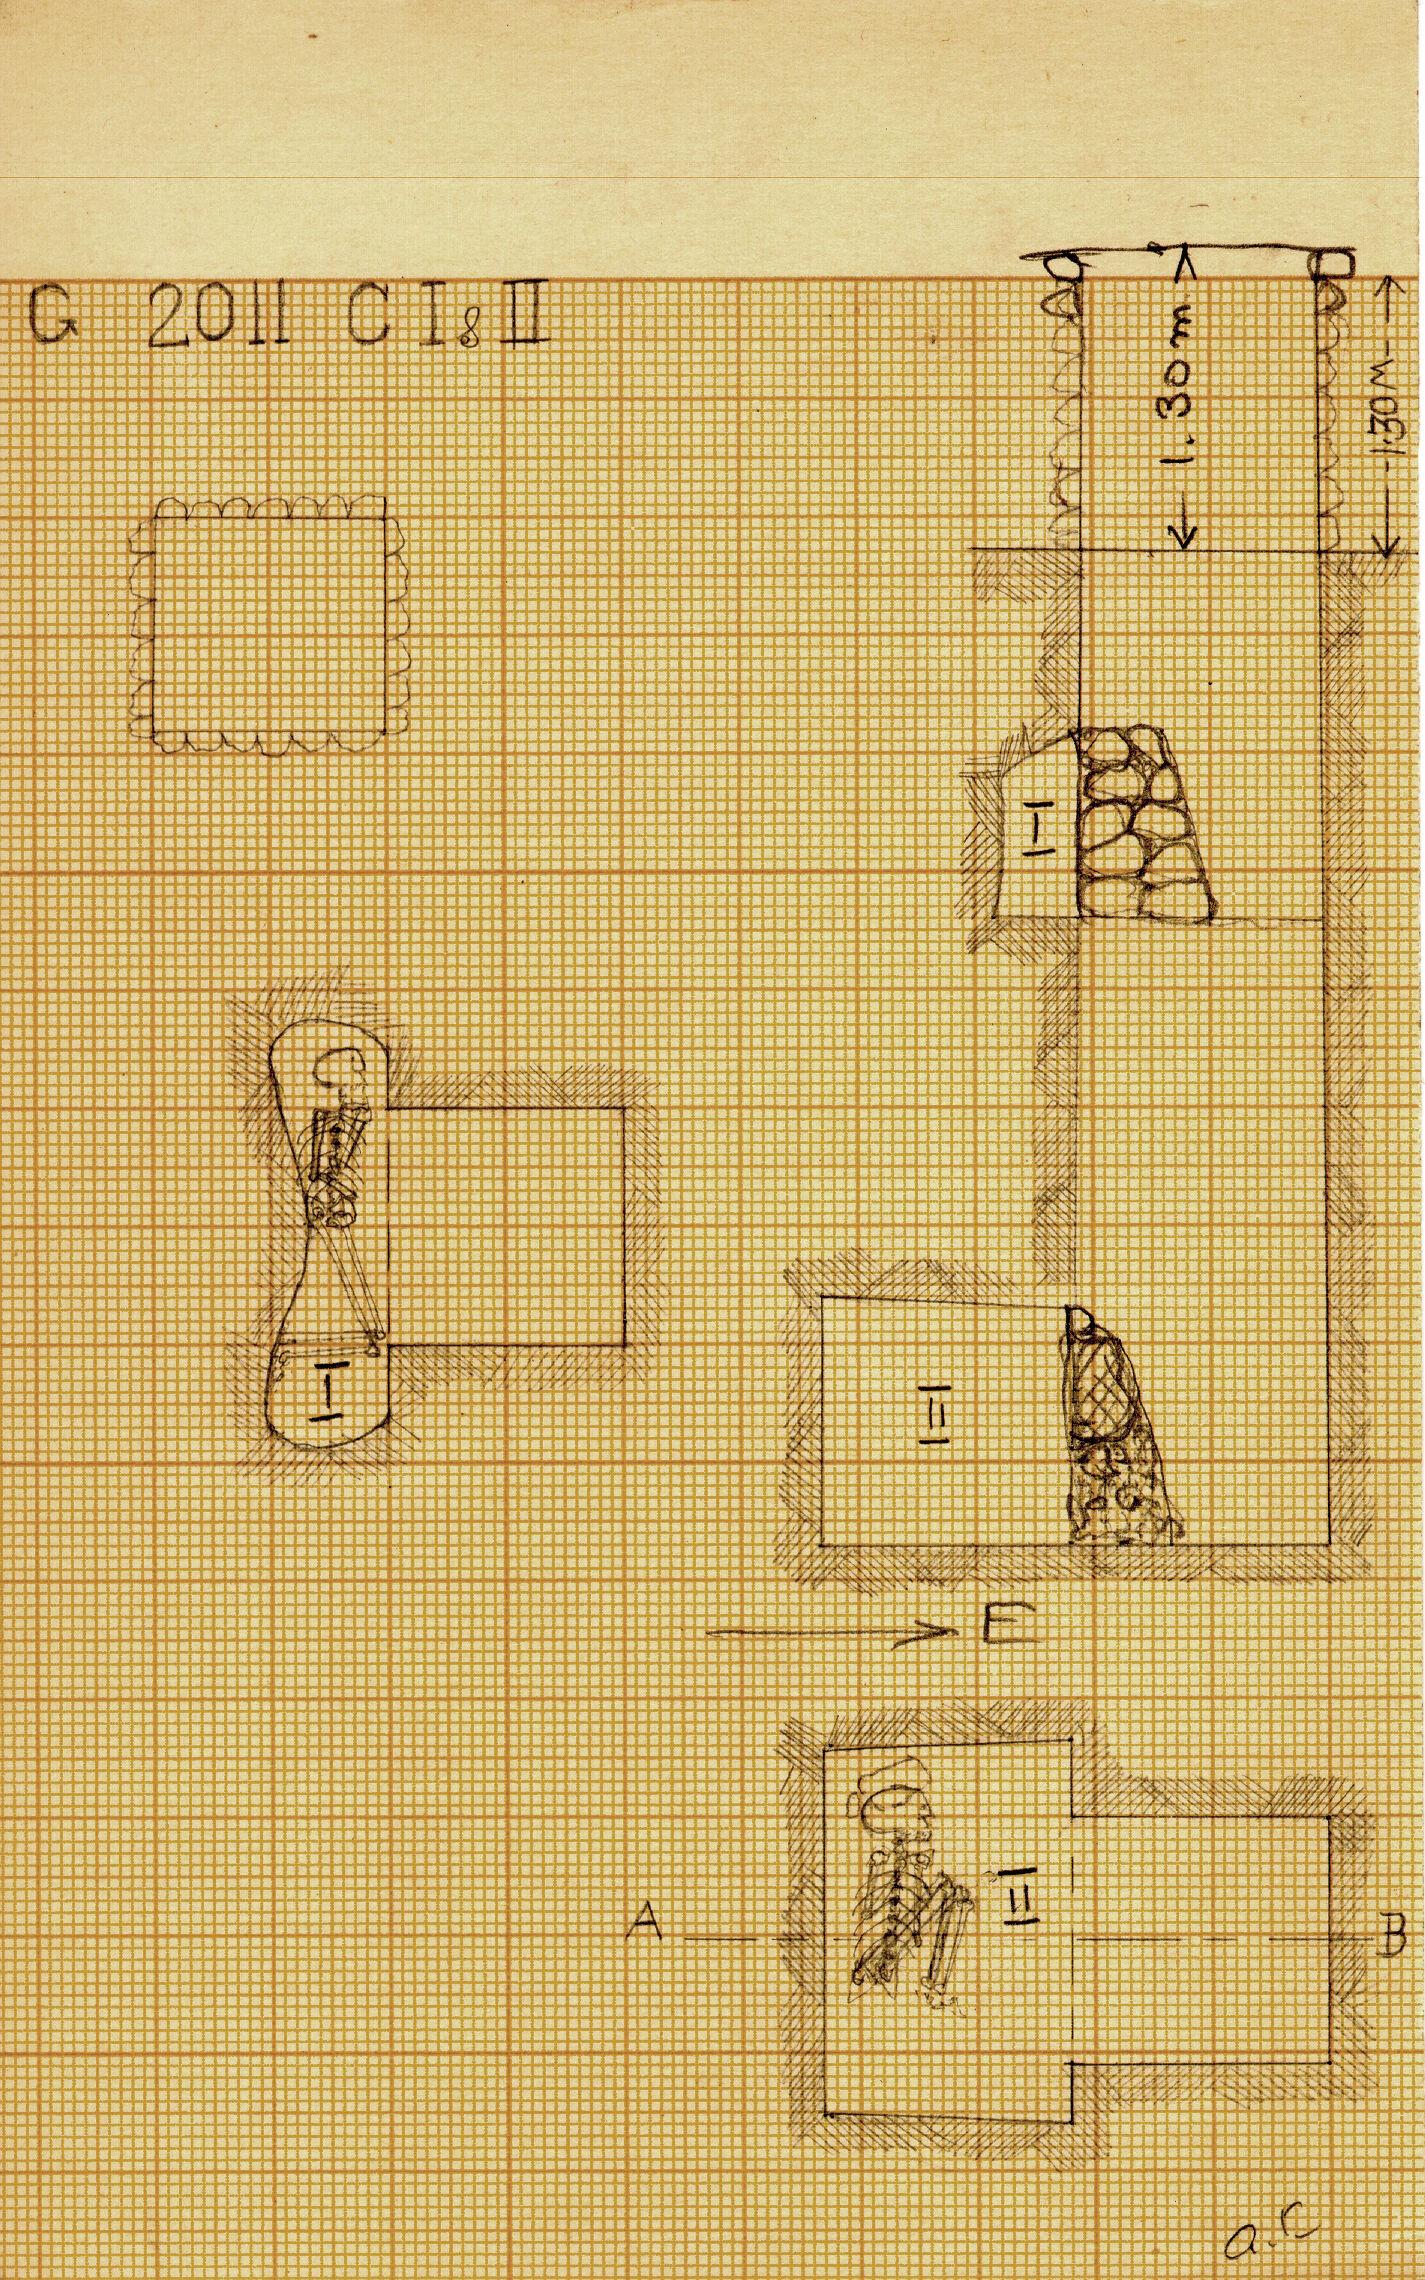 Maps and plans: G 2011, Shaft C (I & II)